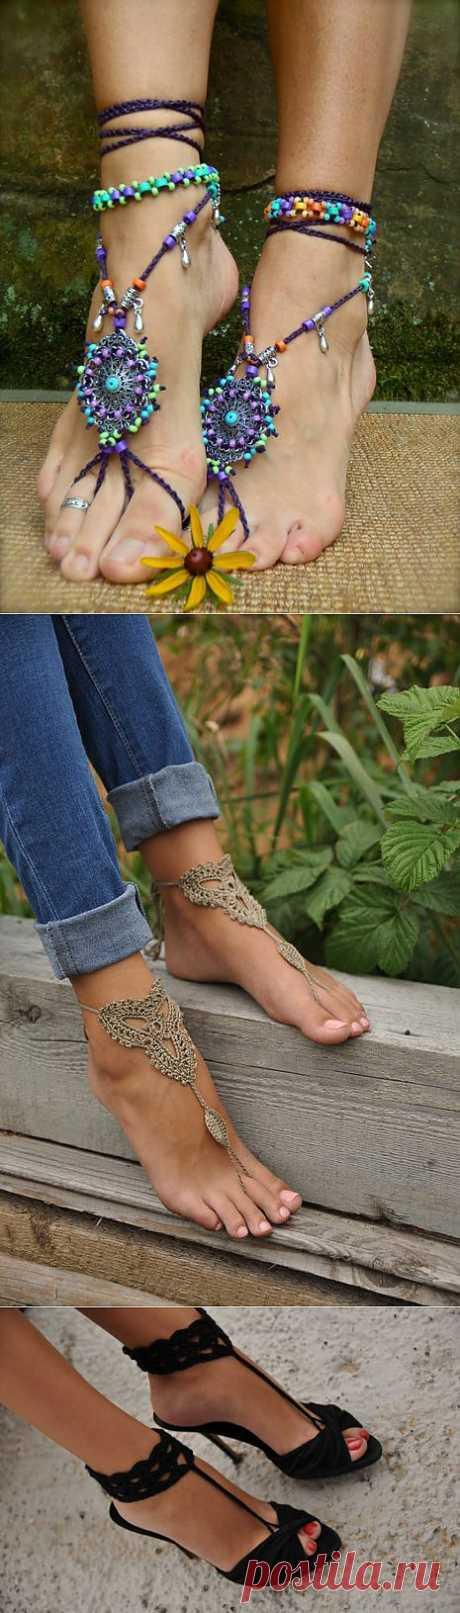 Barefoot legs....